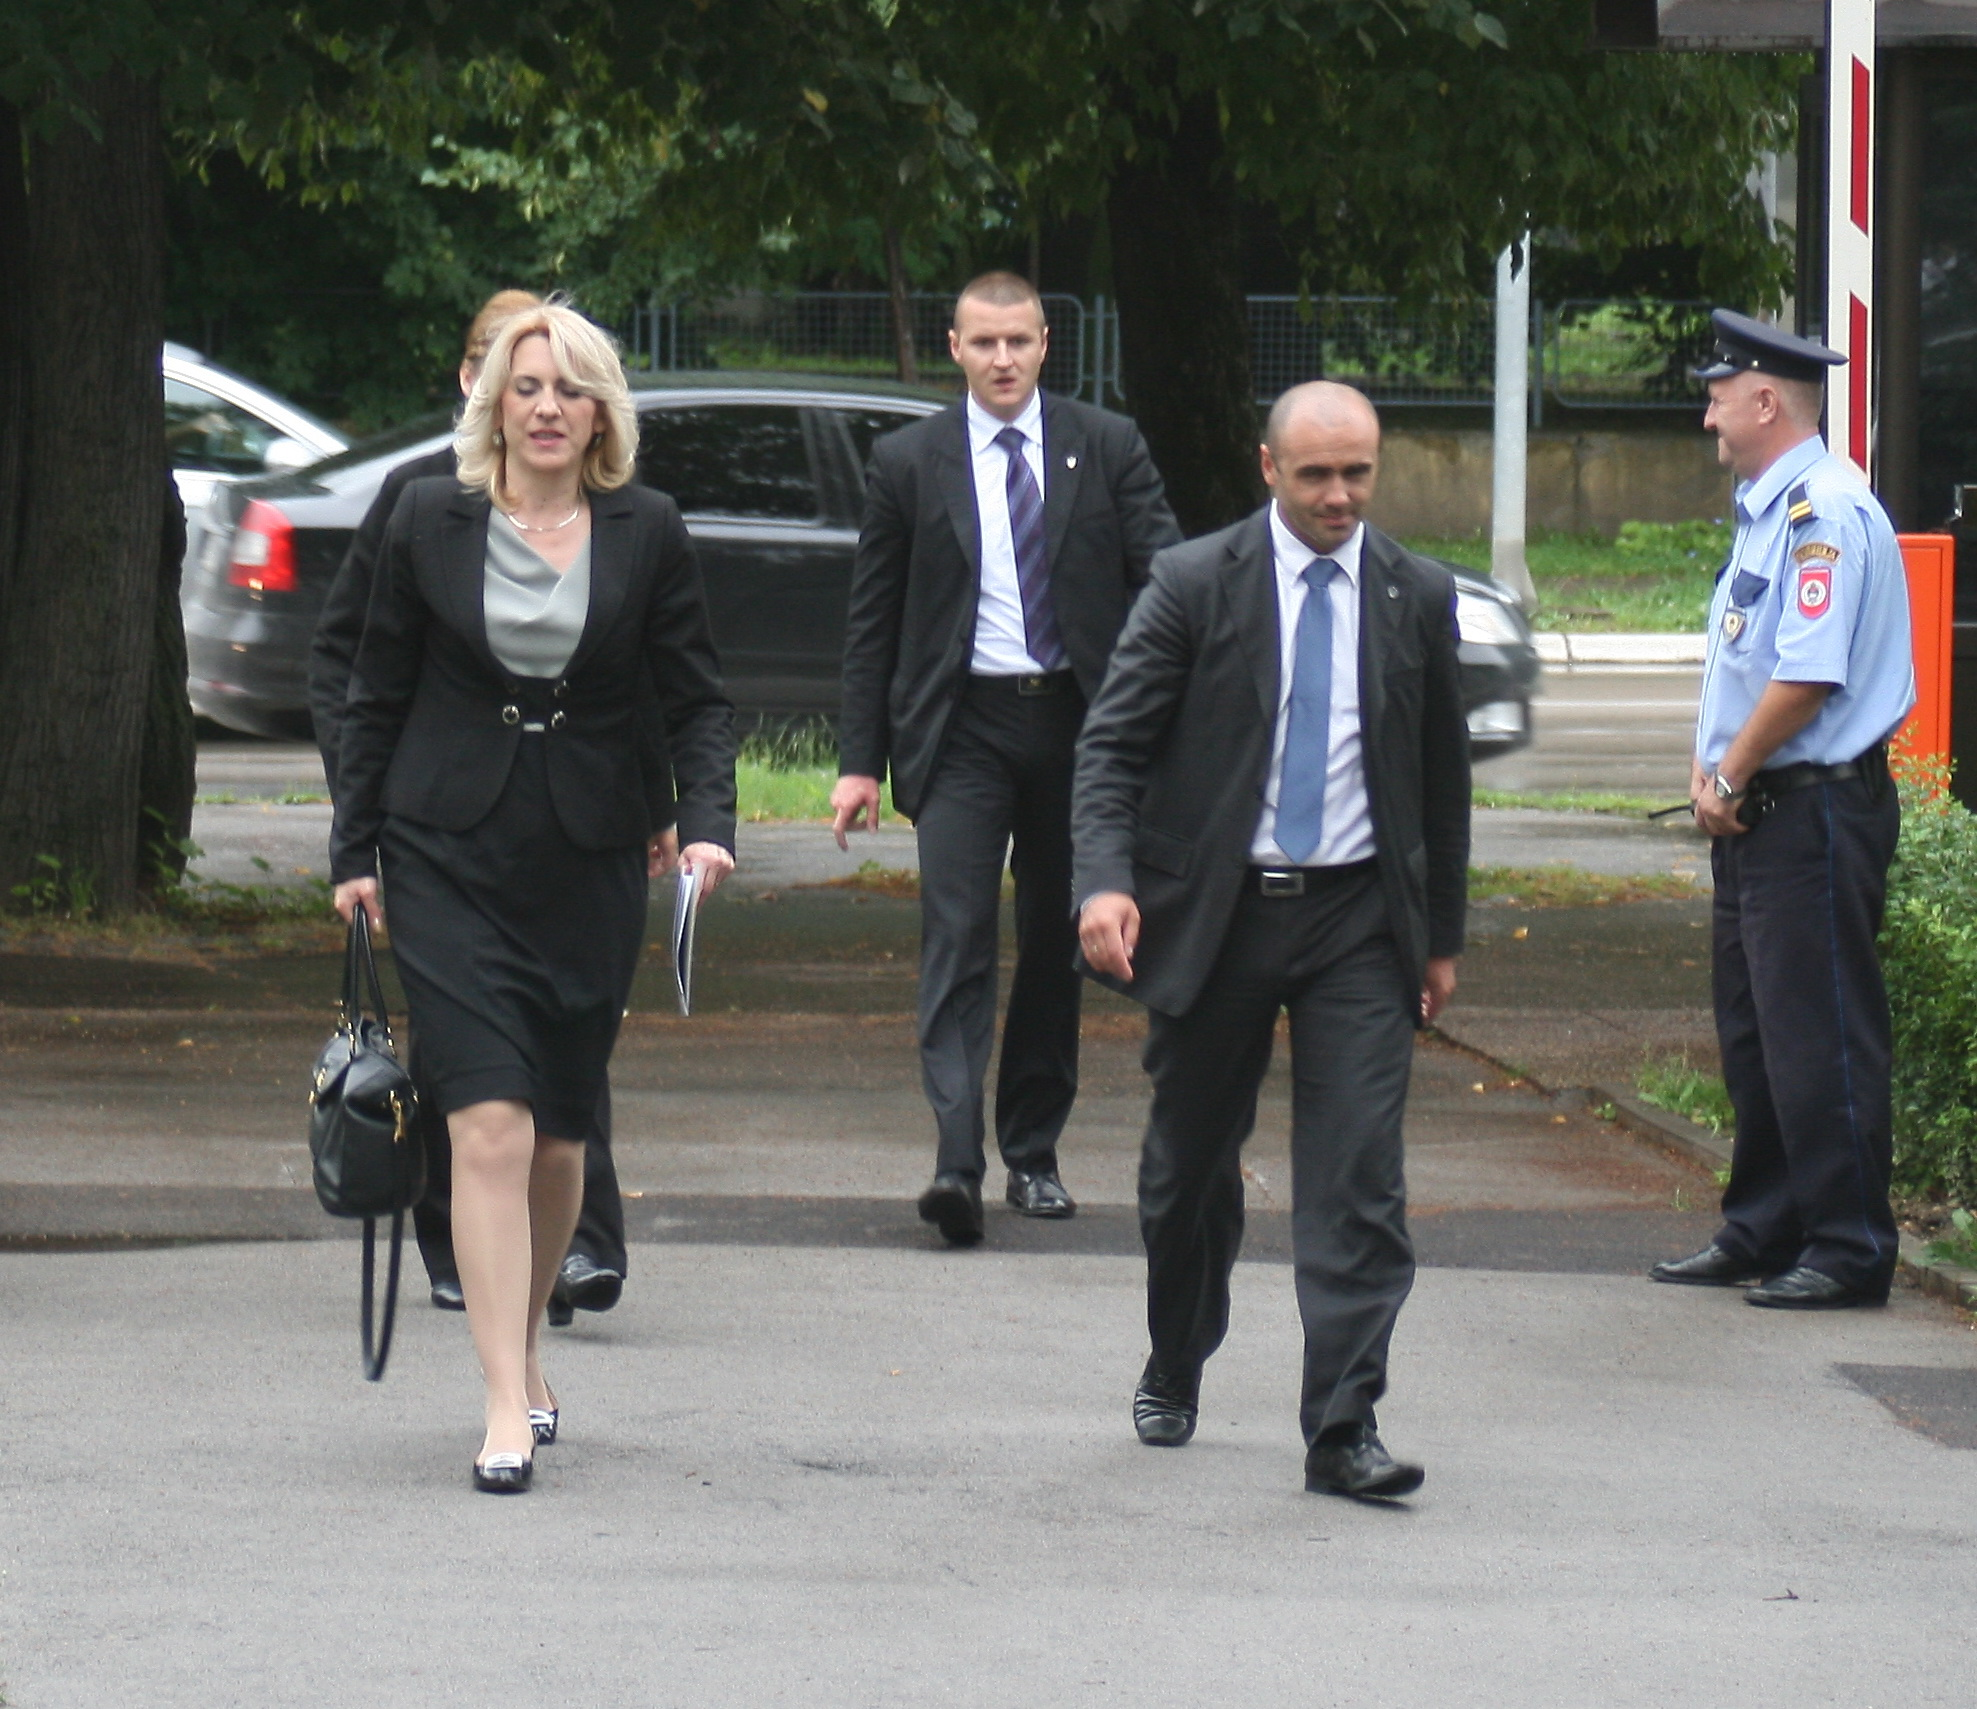 Zeljka Cvijanovic candidate for Serb member of BiH Presidency for SNSD